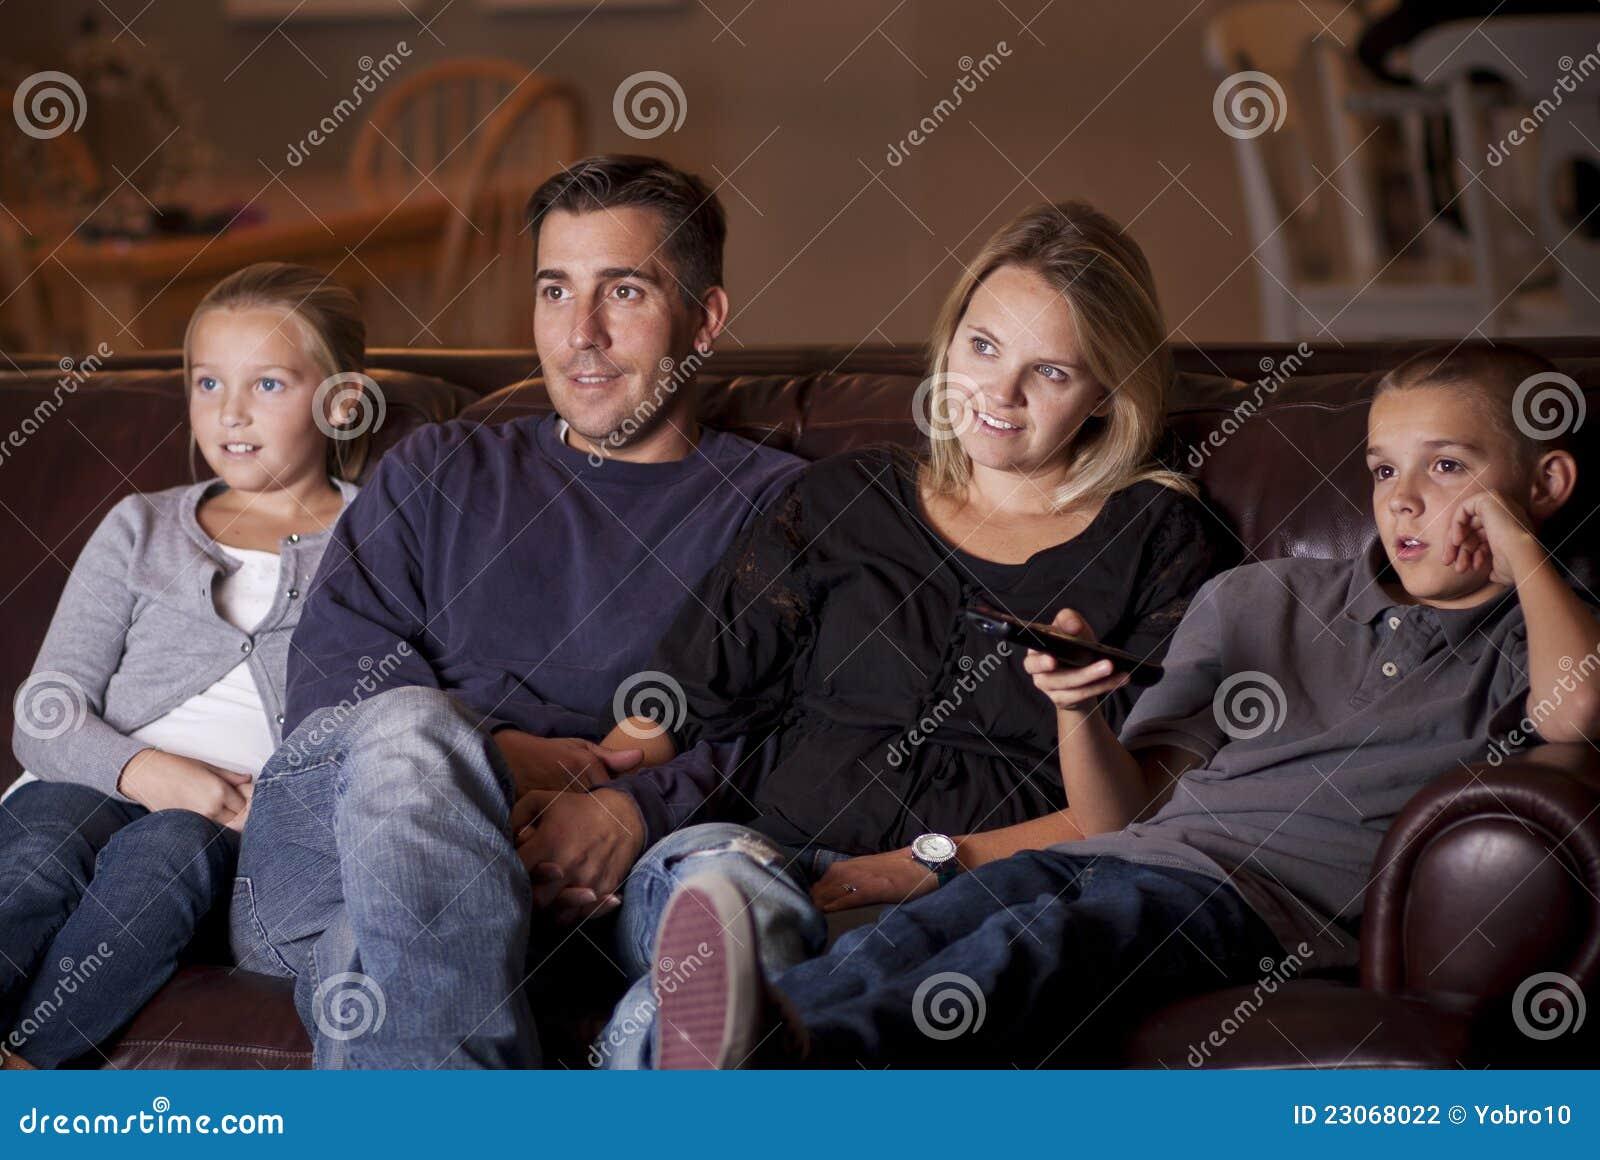 family watching television cartoon vector cartoondealer